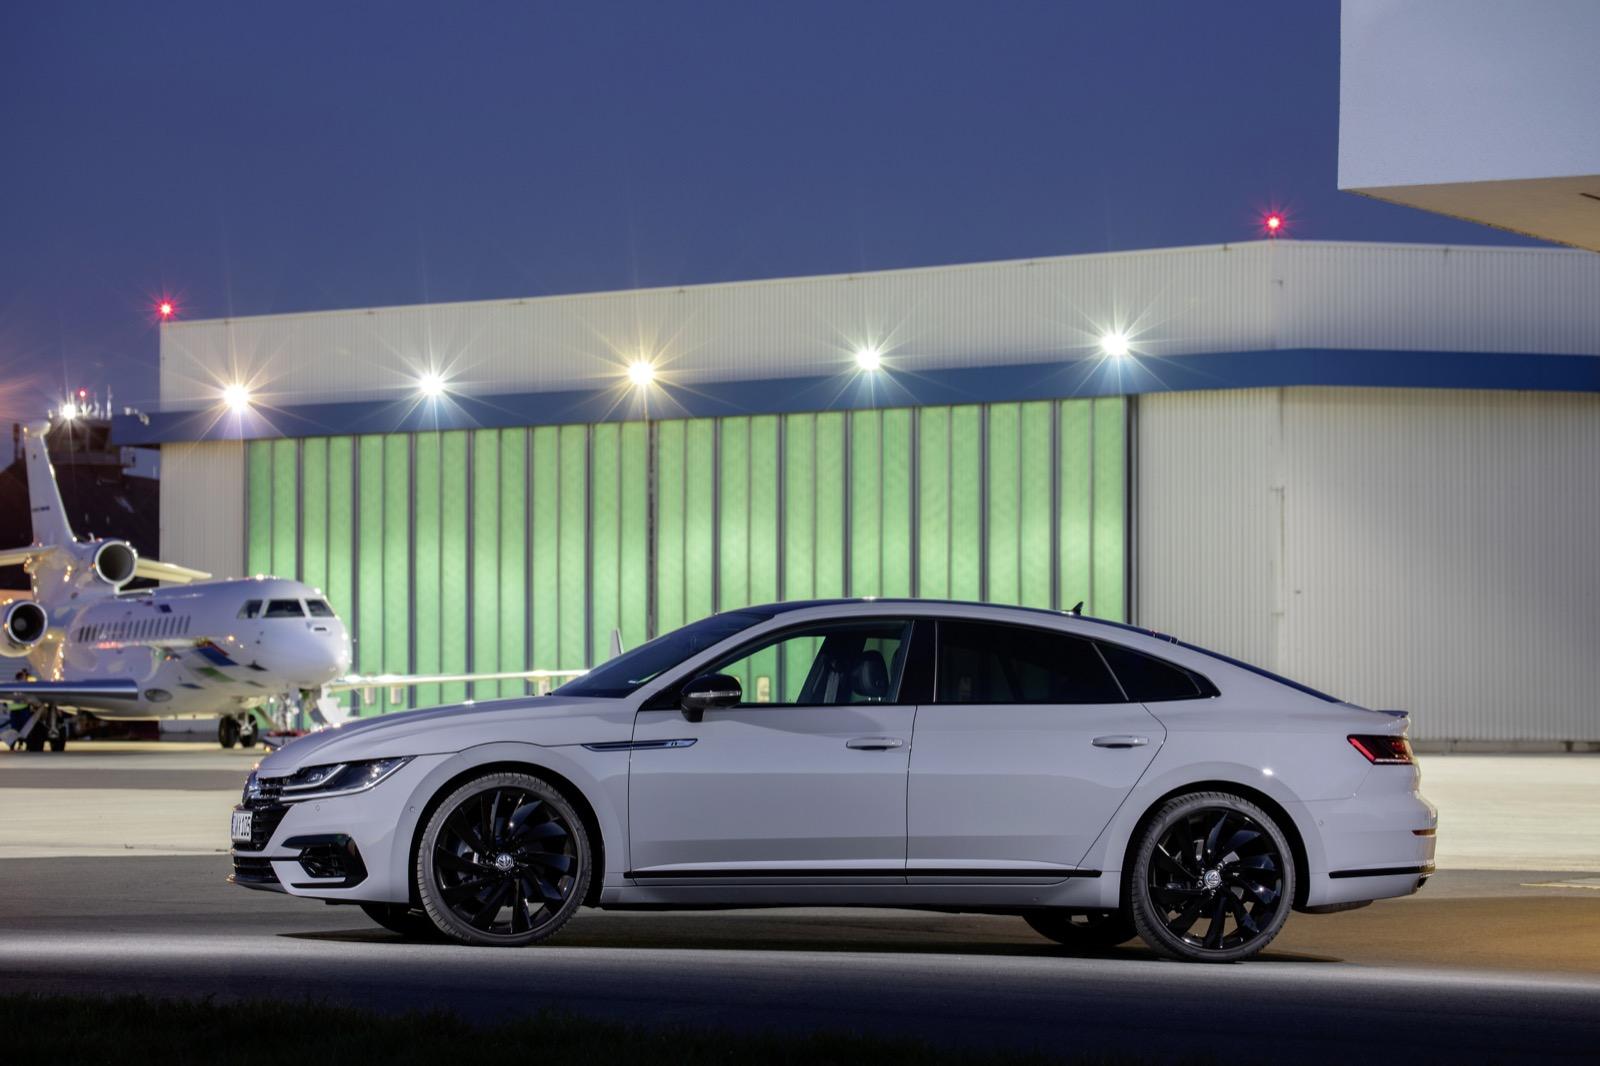 The New Volkswagen Arteon R Line Edition